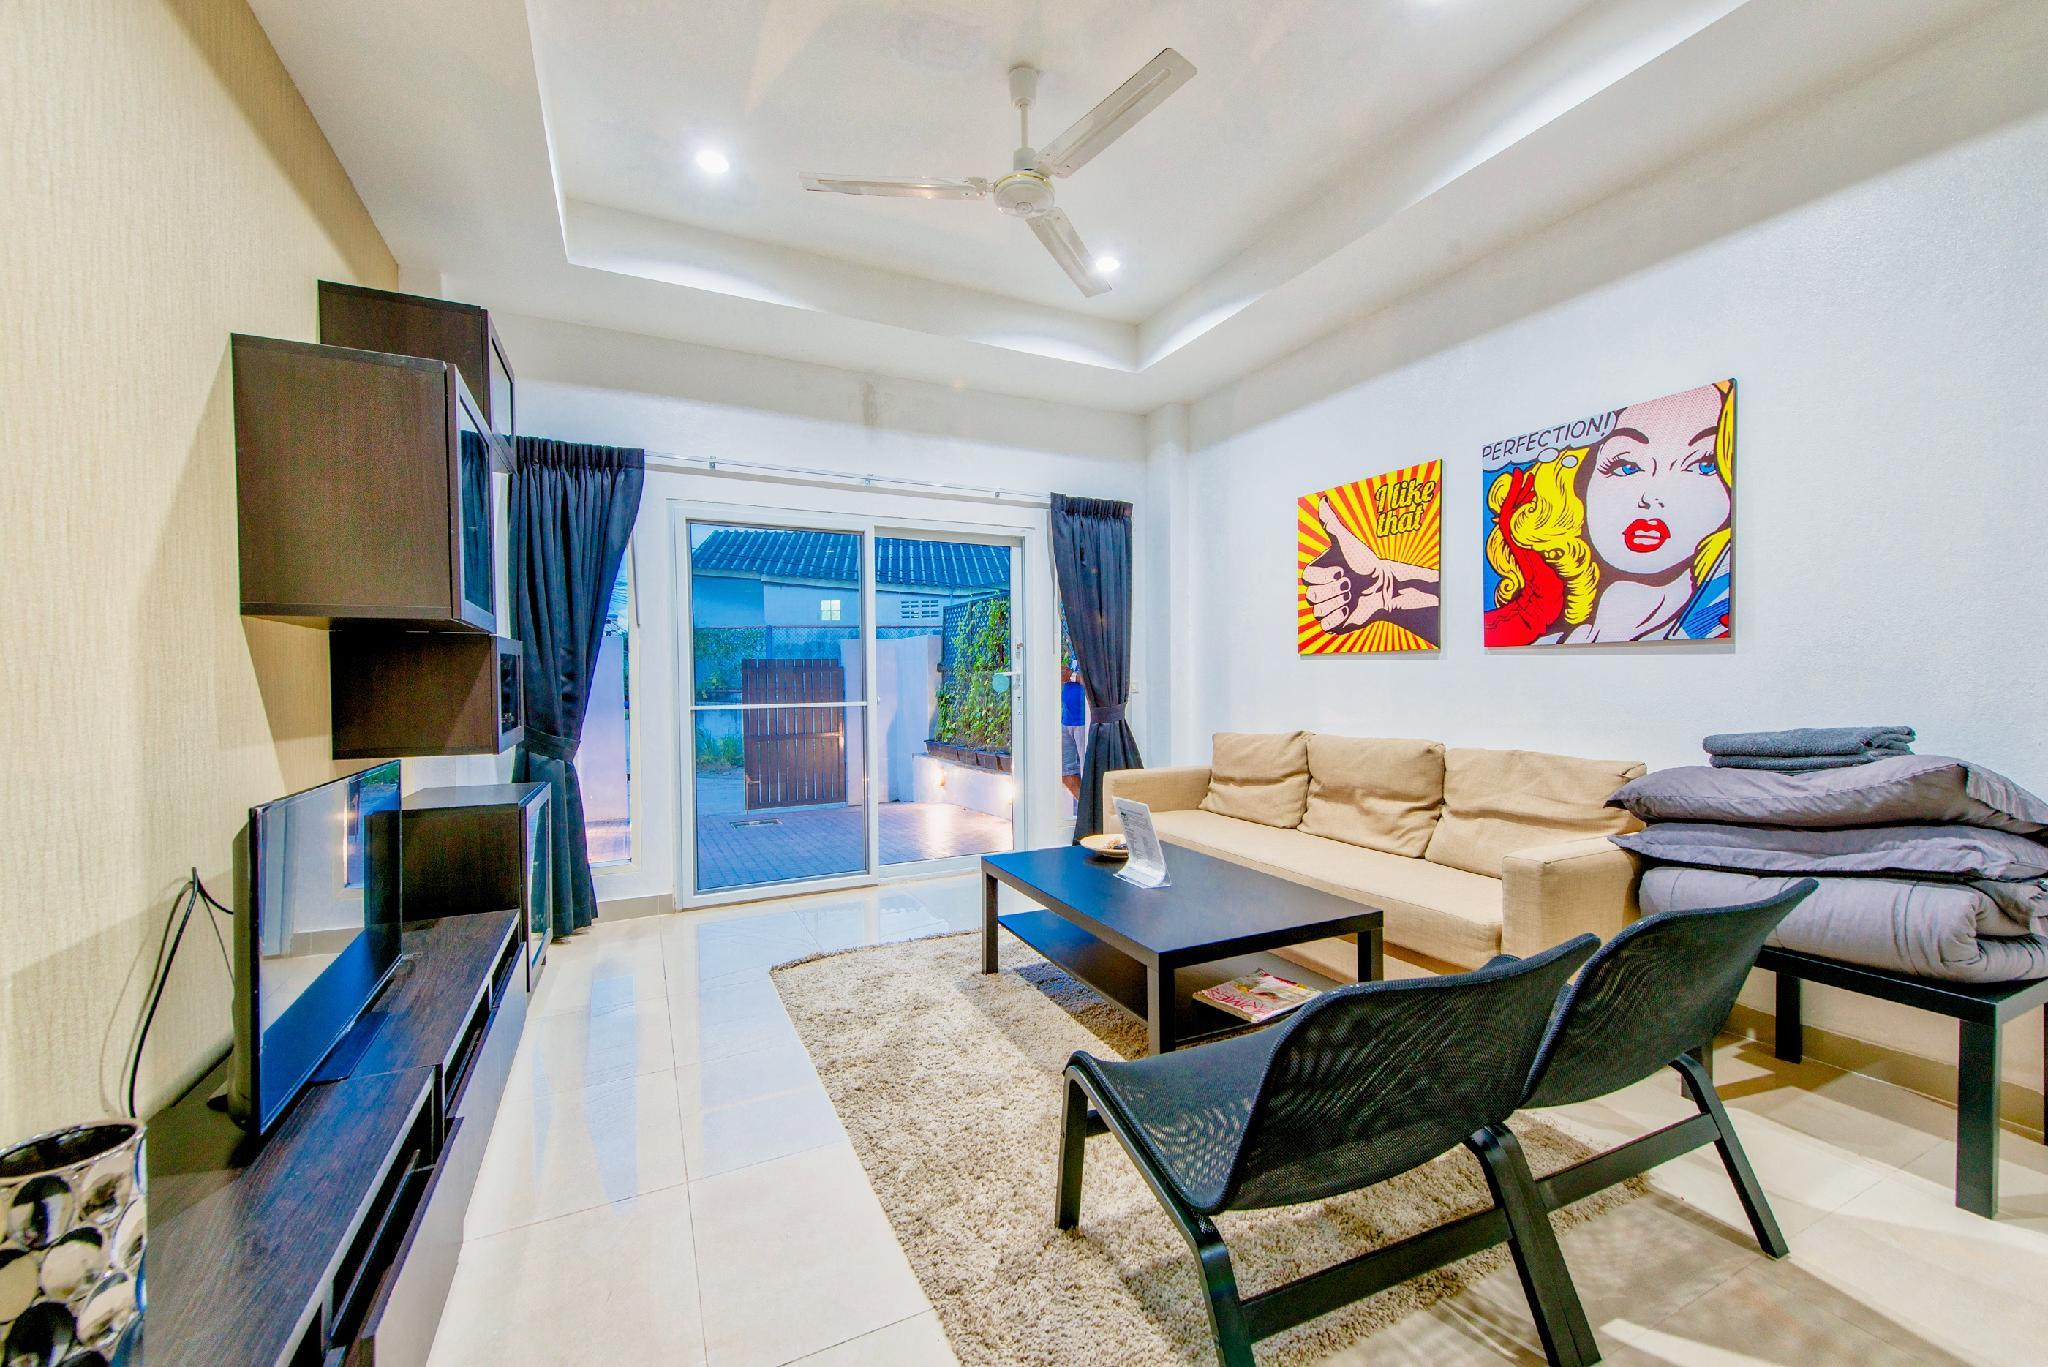 Review Luxus Jacuzzi Villa - near beach